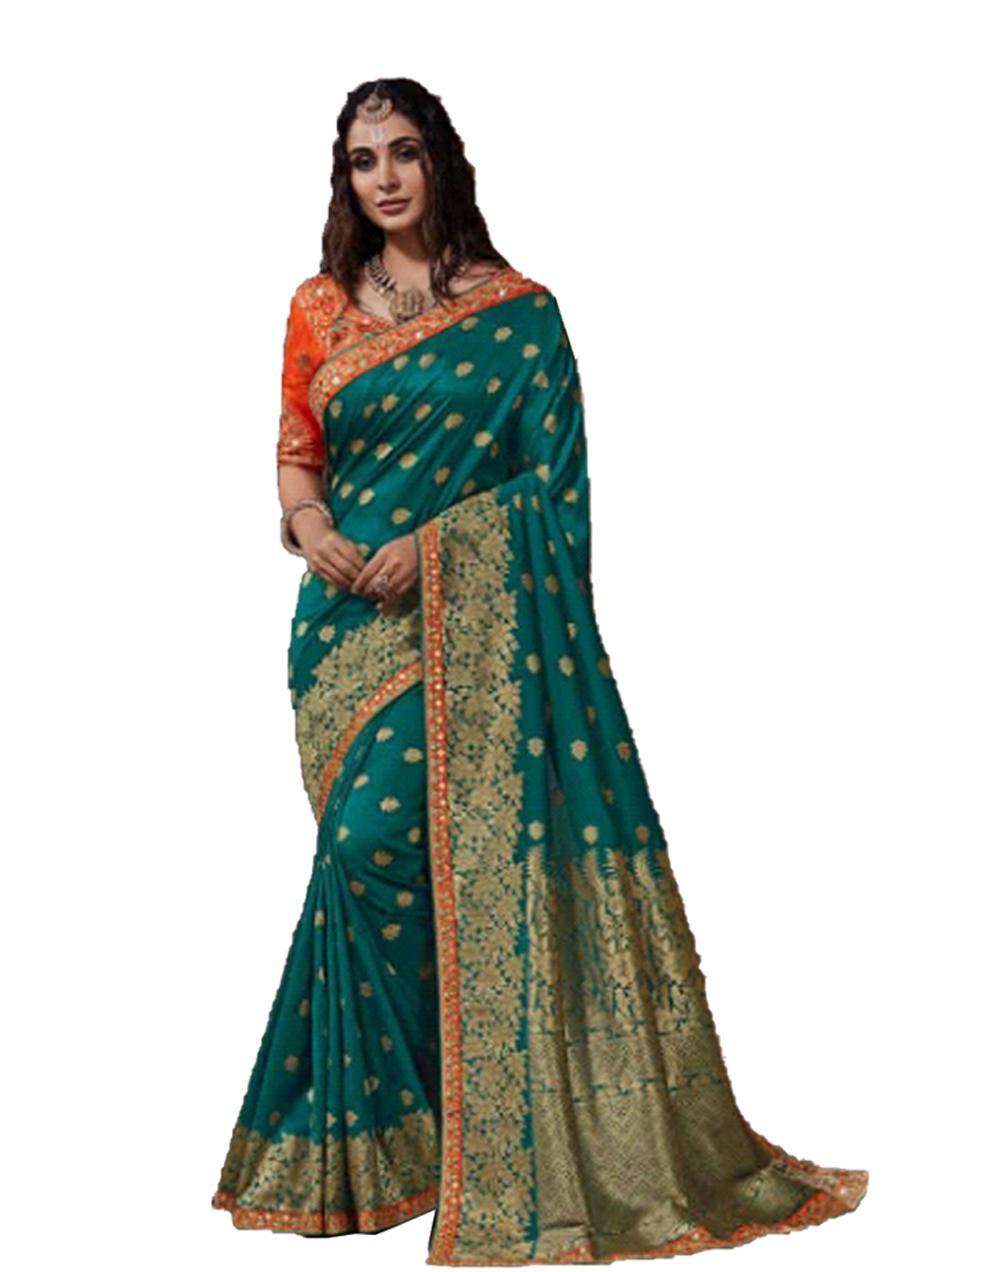 Morpeach Silk Saree With Blouse SD23891